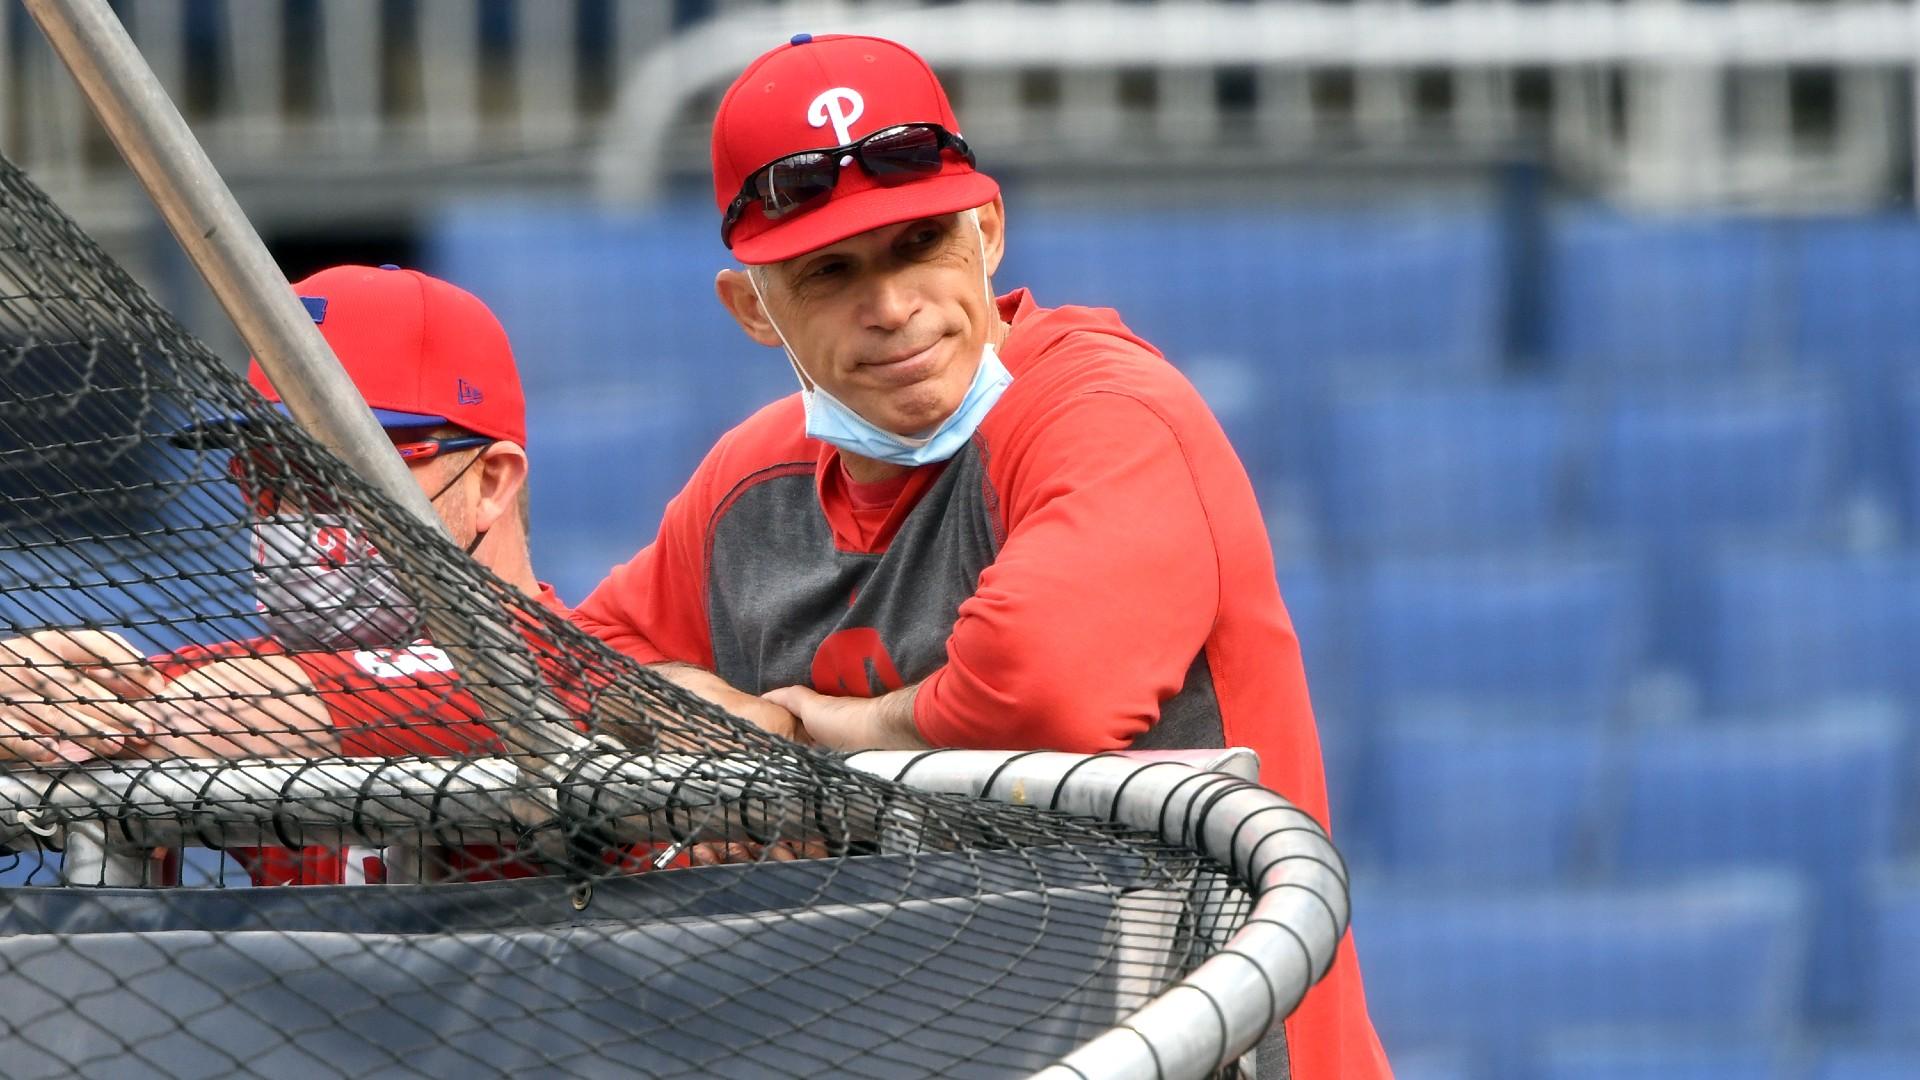 Nationals GM slams 'embarrassing' Phillies manager Joe Girardi: 'He's a con man'